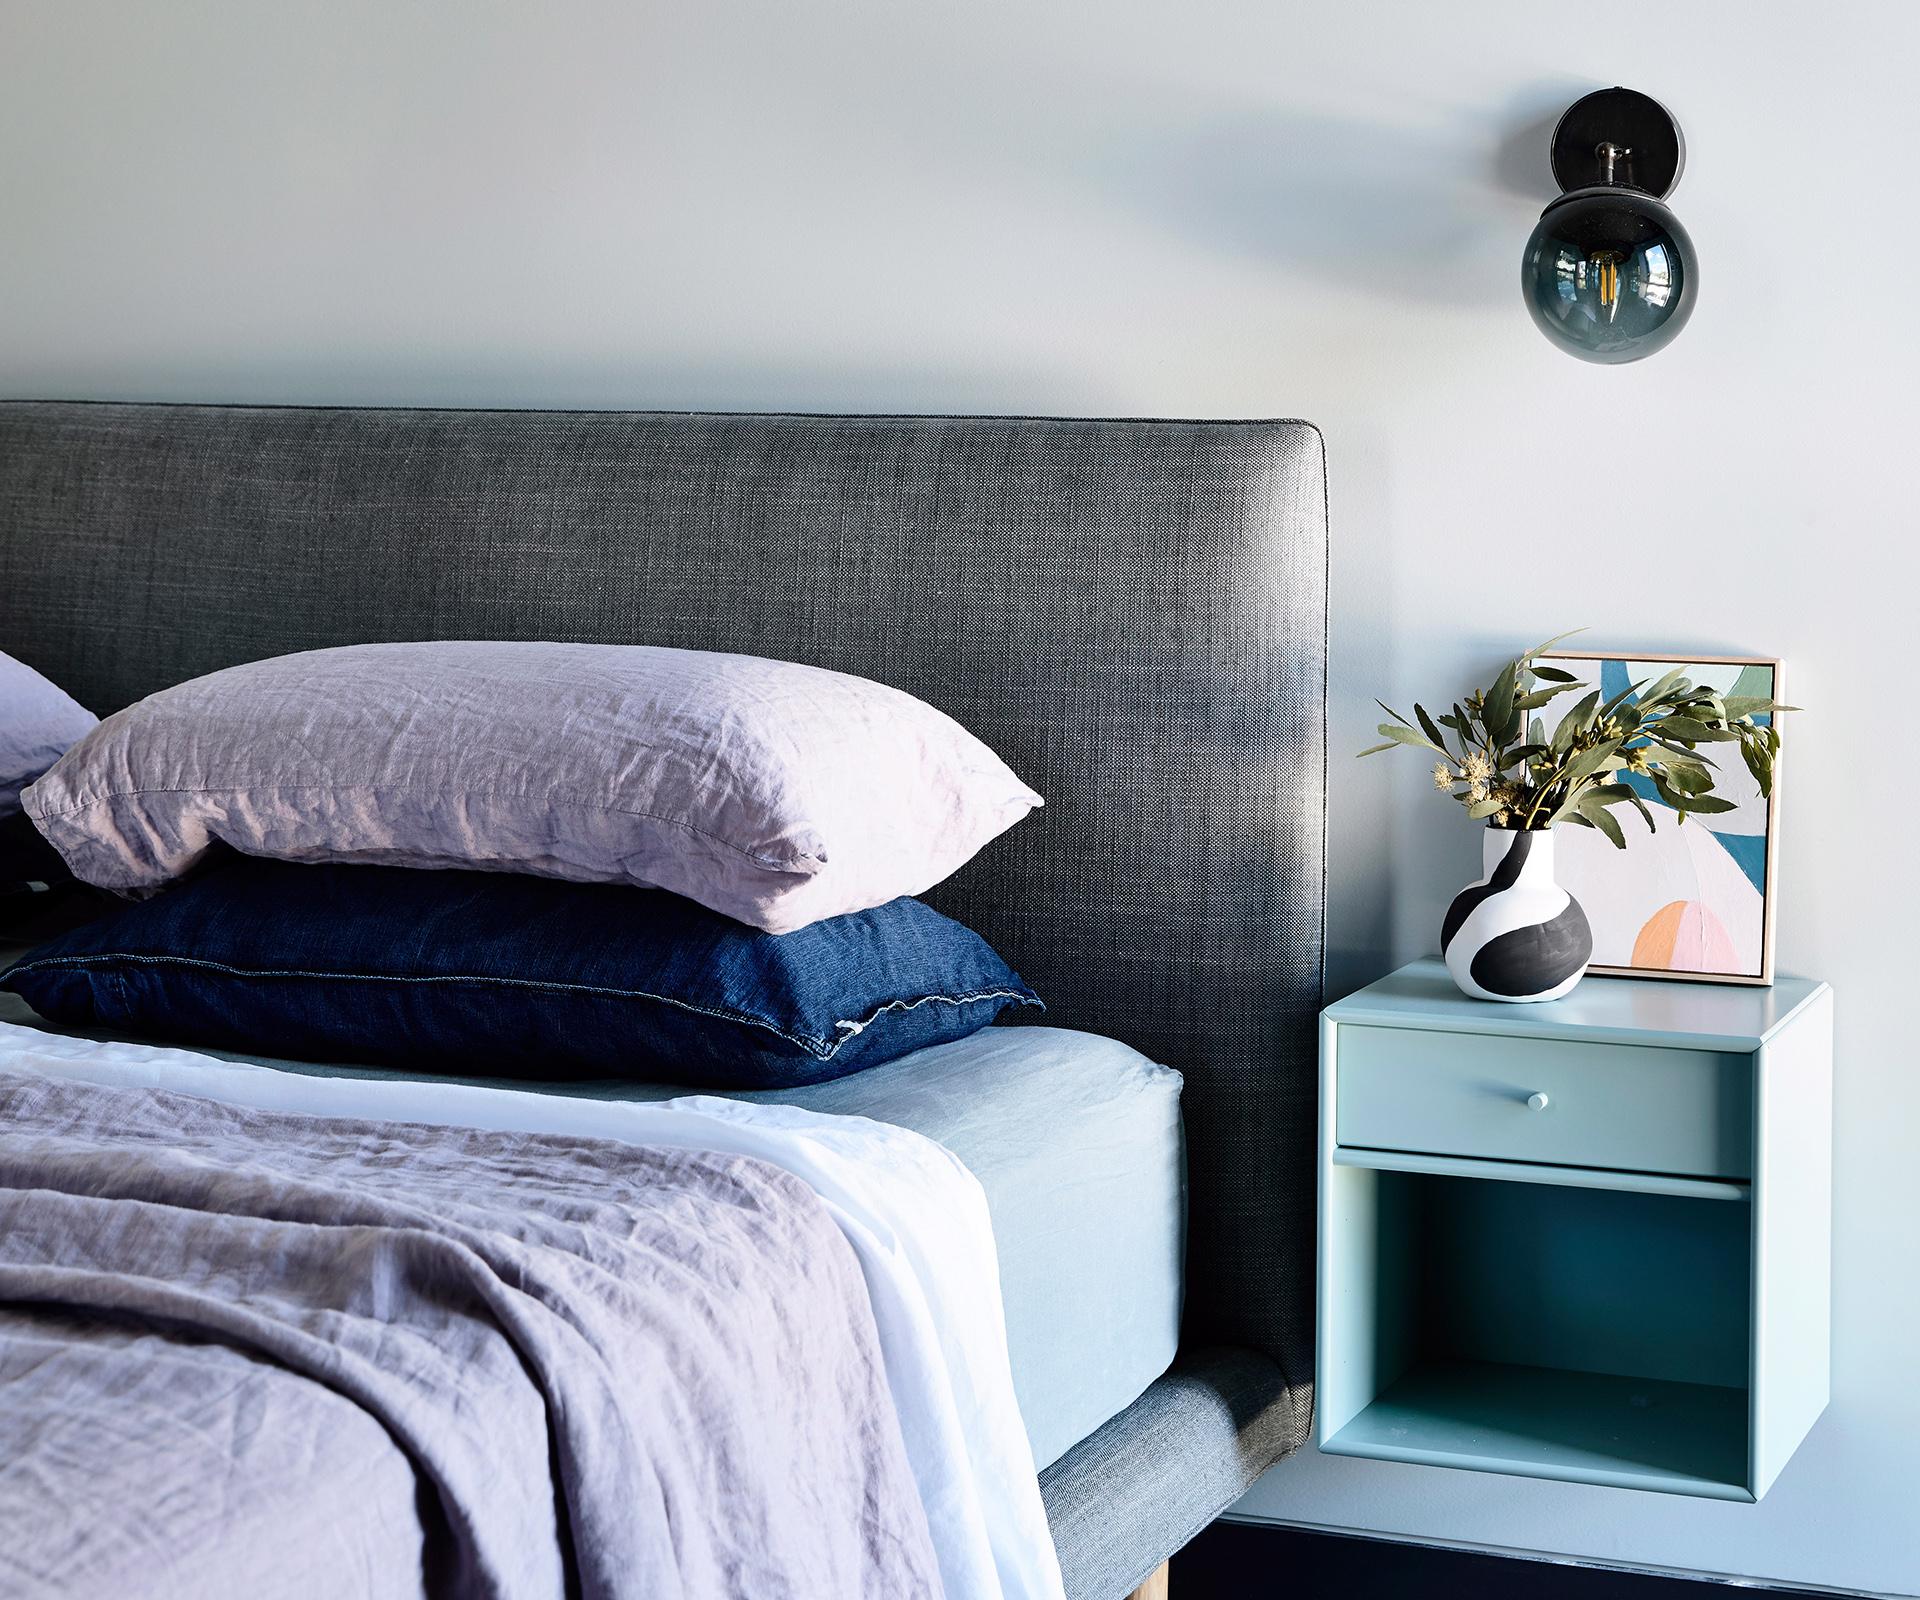 Sleep tips: 9 steps to a good night's sleep